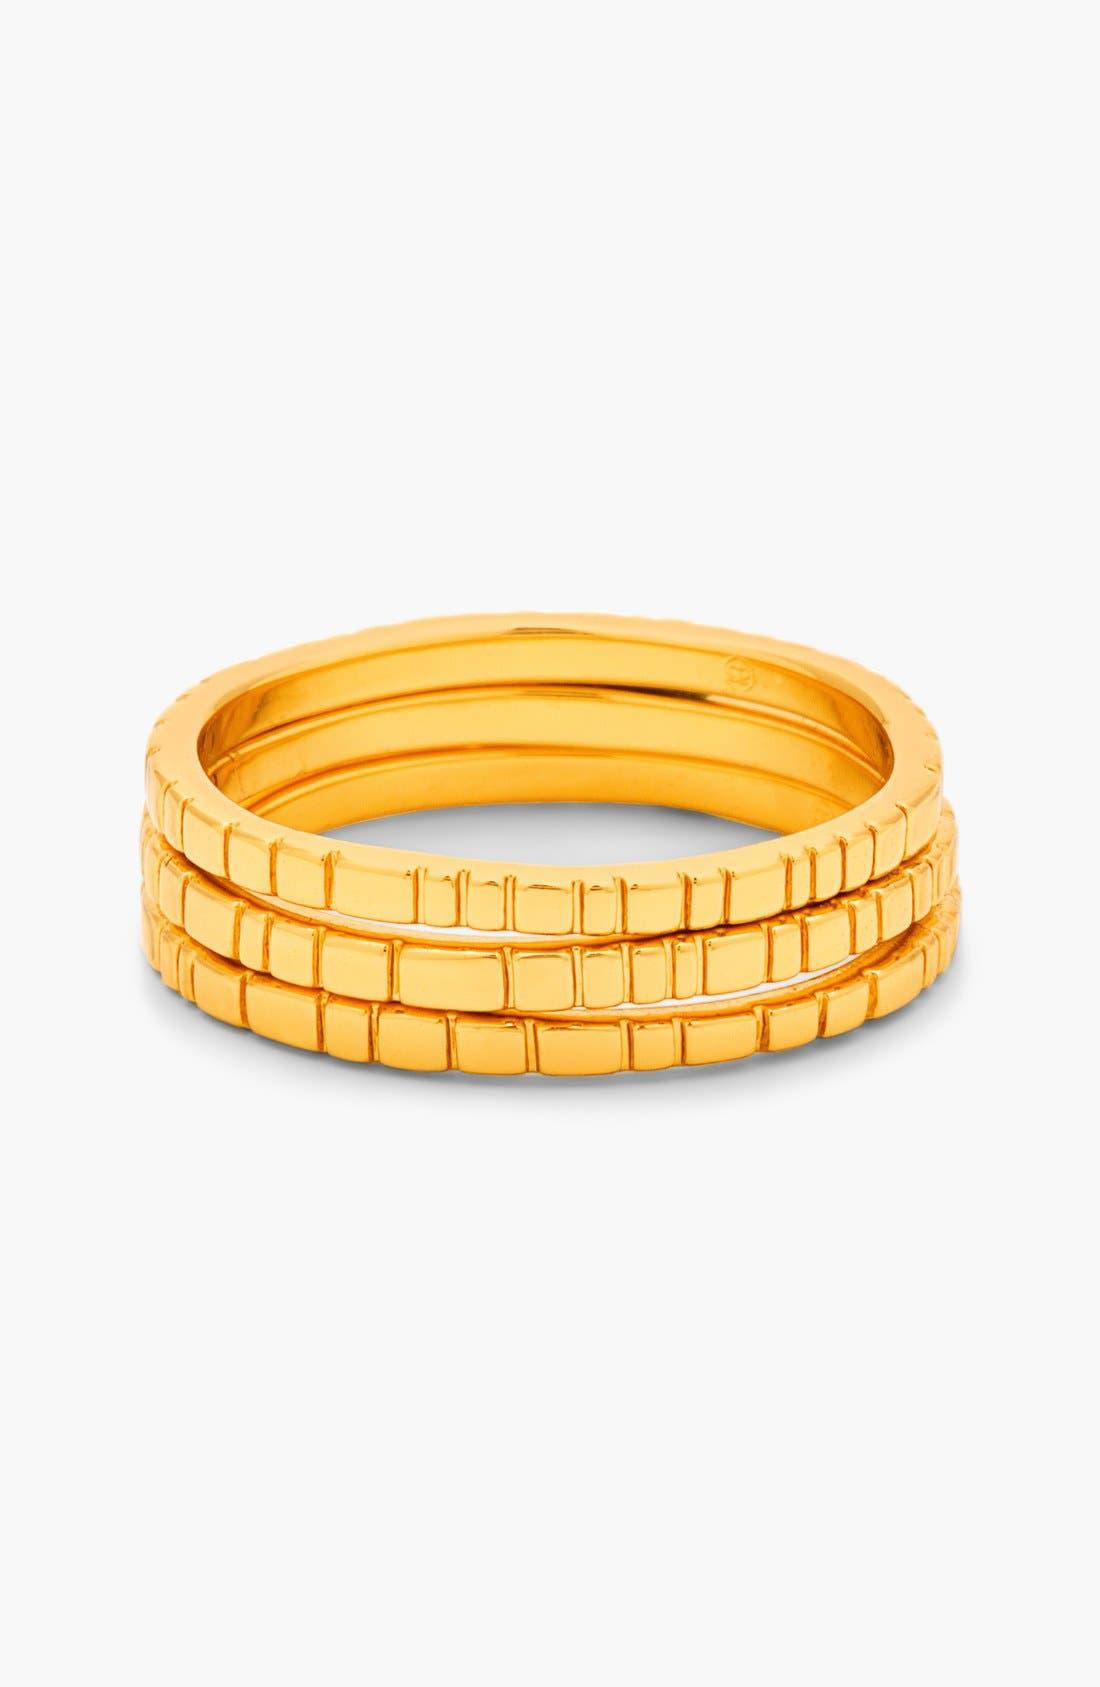 Main Image - gorjana 'Evi' Midi Rings (Set of 3)